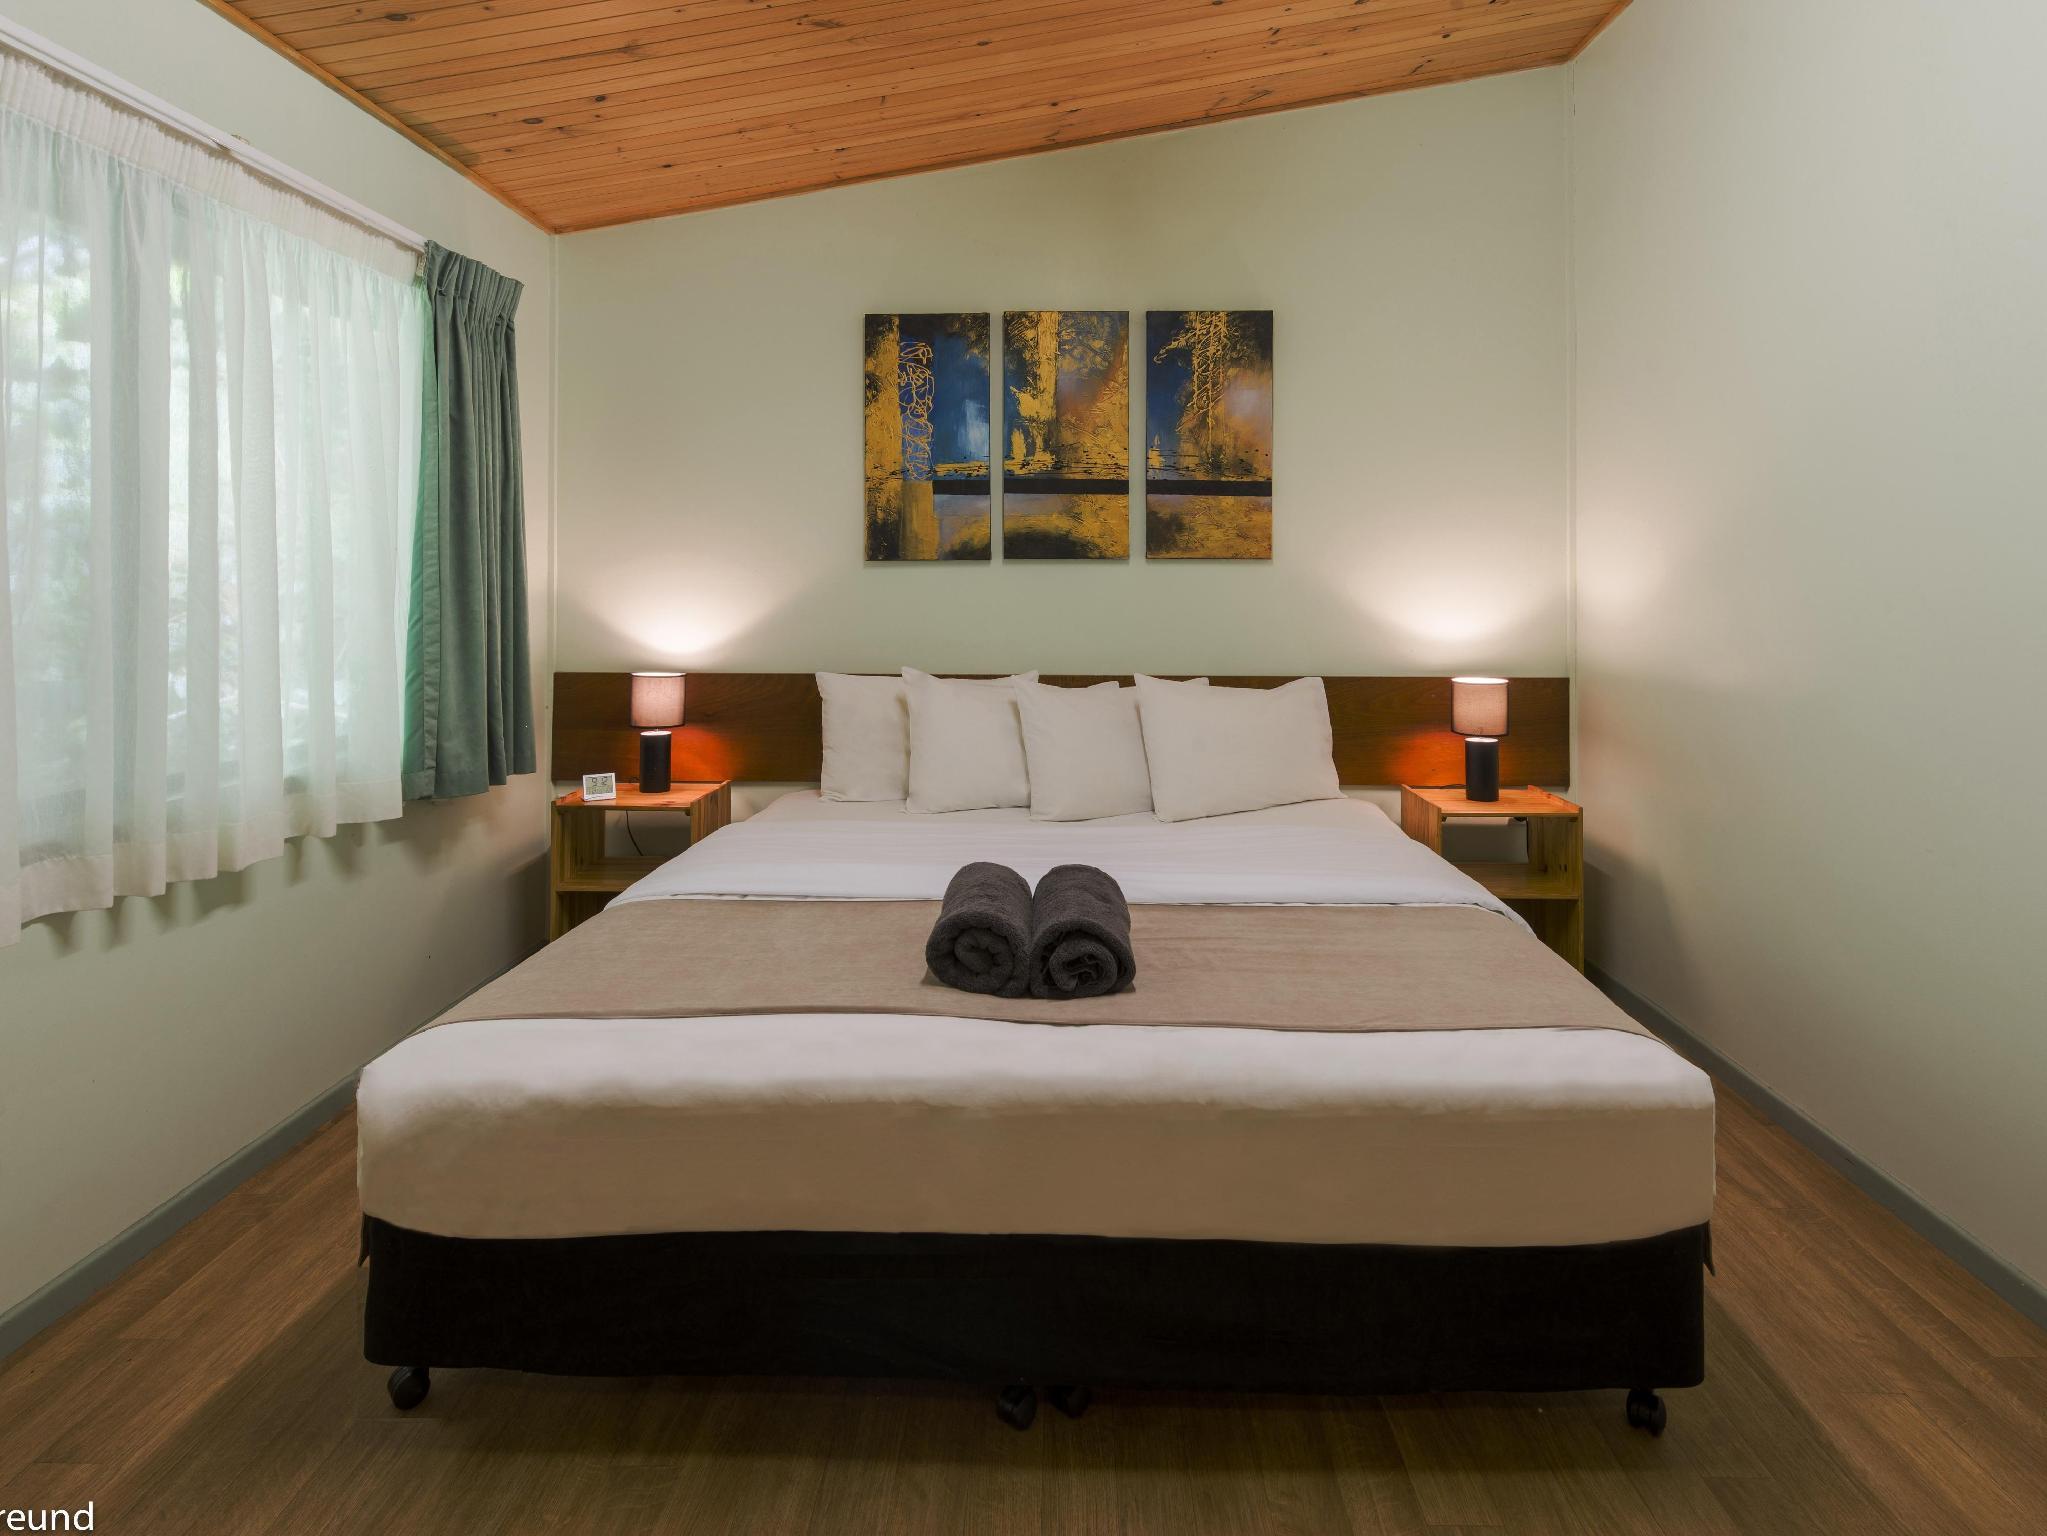 Chambers Wildlife Rainforest Lodges - Hotell och Boende i Australien , Atherton Tablelands